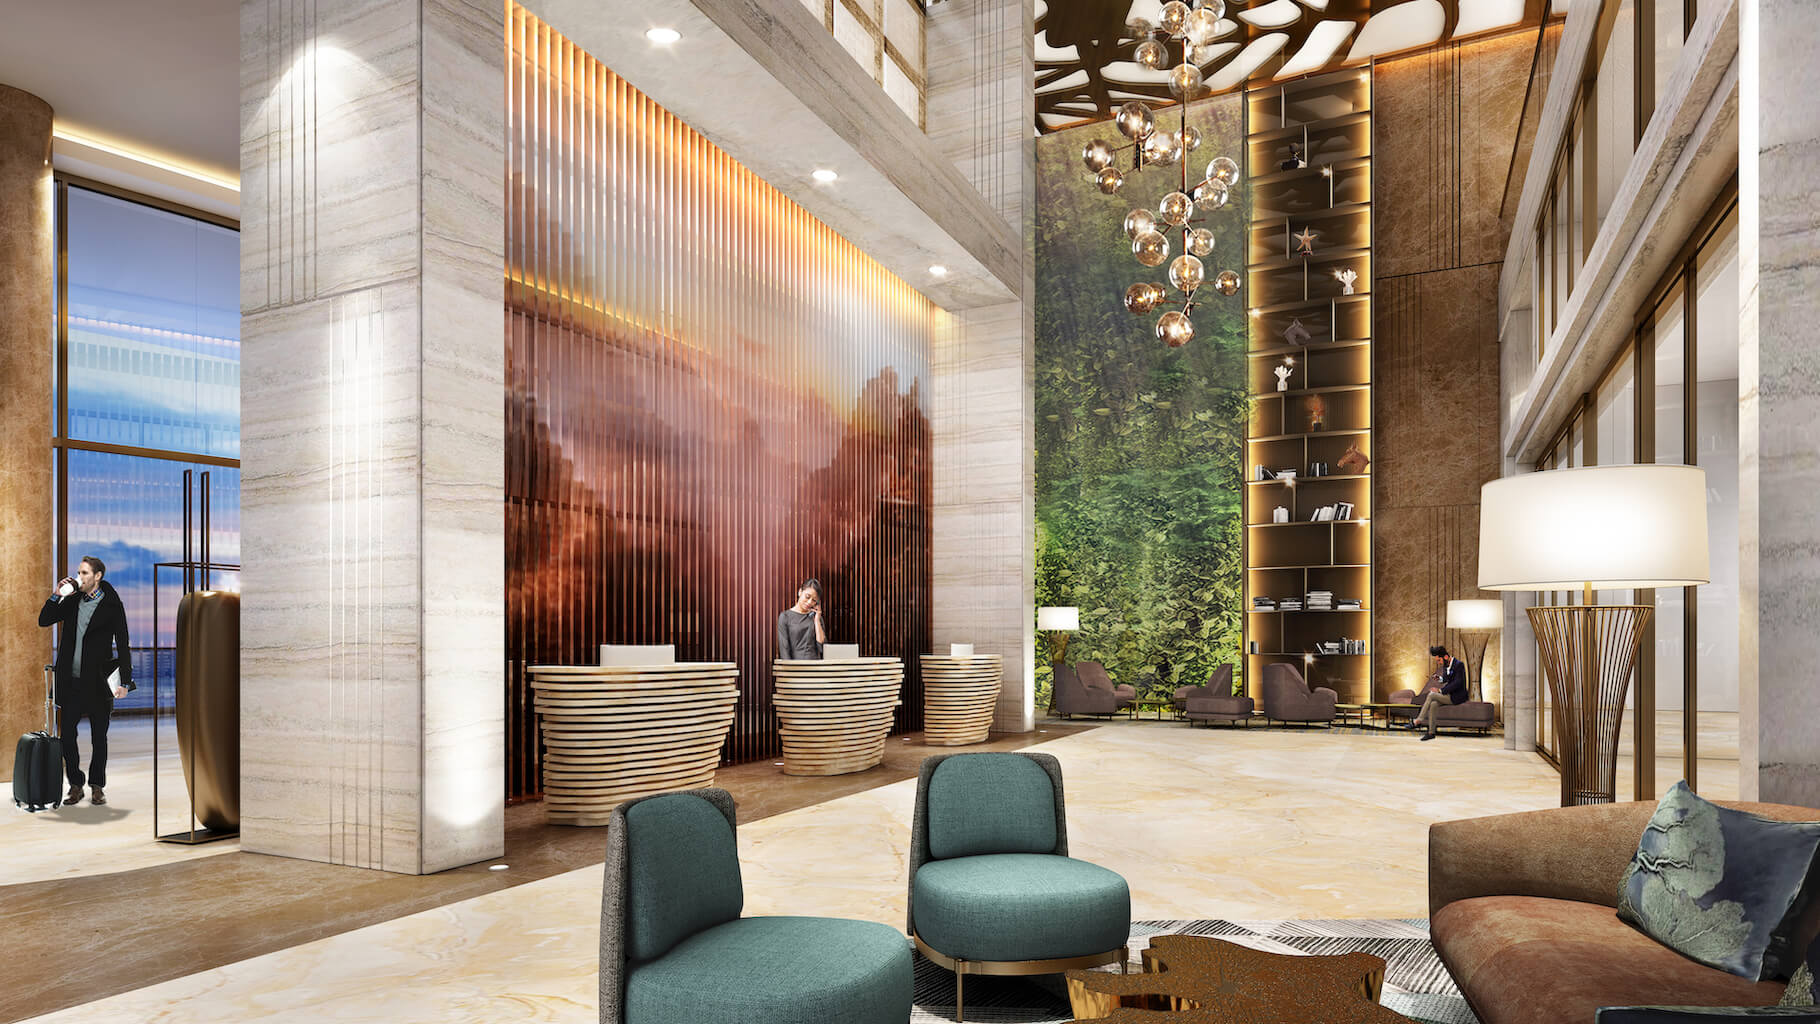 Top Interior Designers From Dubai top interior designers from dubai Top Interior Designers From Dubai – Part II Dubai Swiss